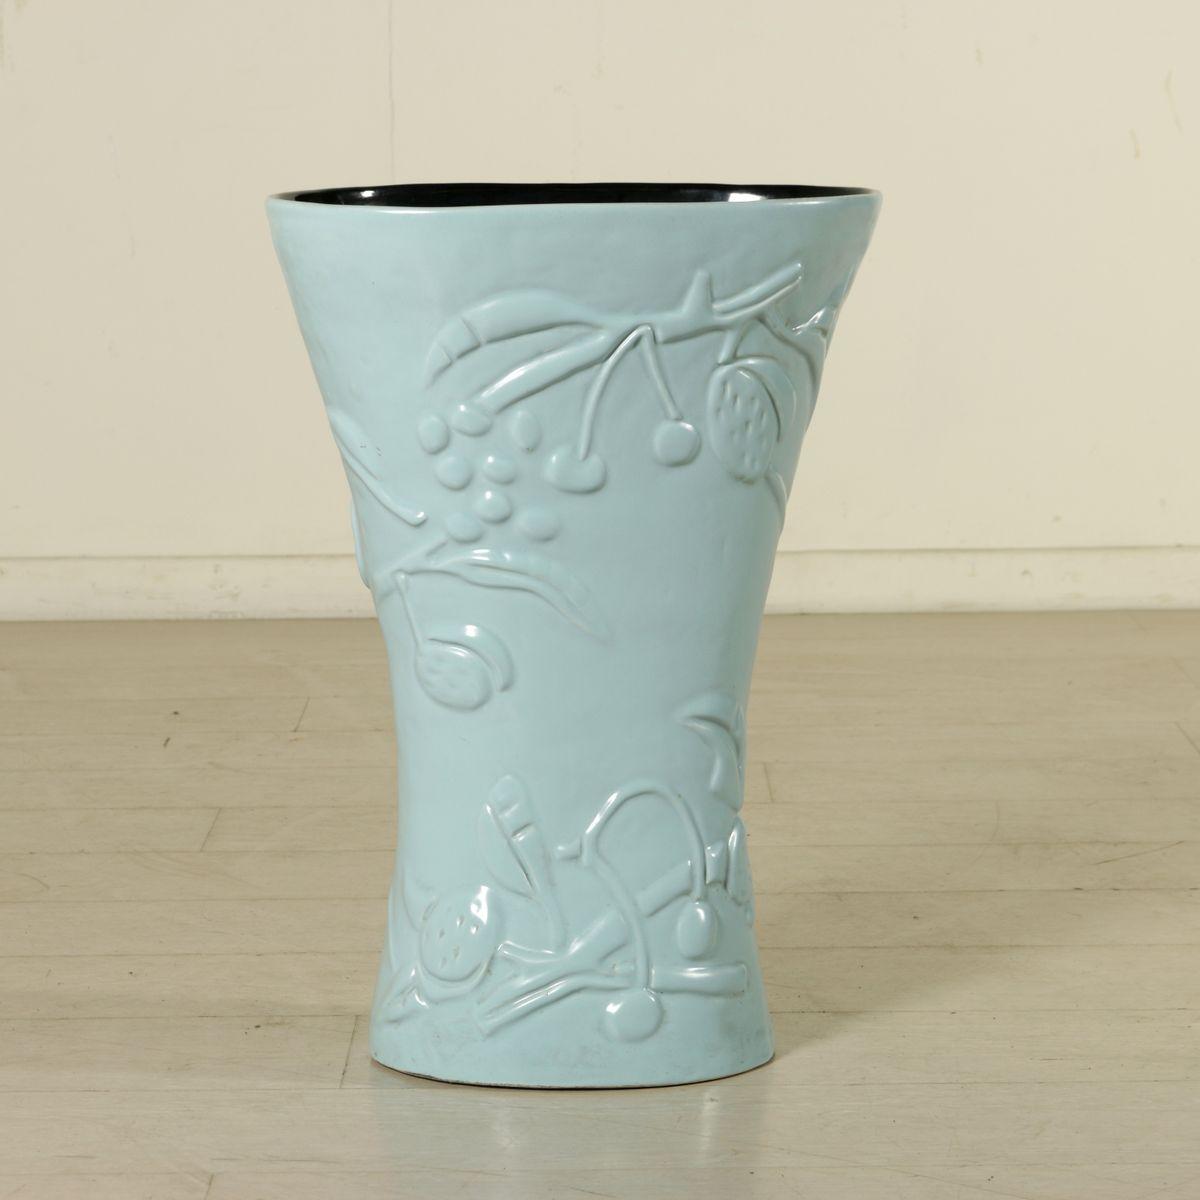 Keramik Vase oder Schirmständer von Antonia Campi für Società Ceramica Italiana Laveno, 1950er ...